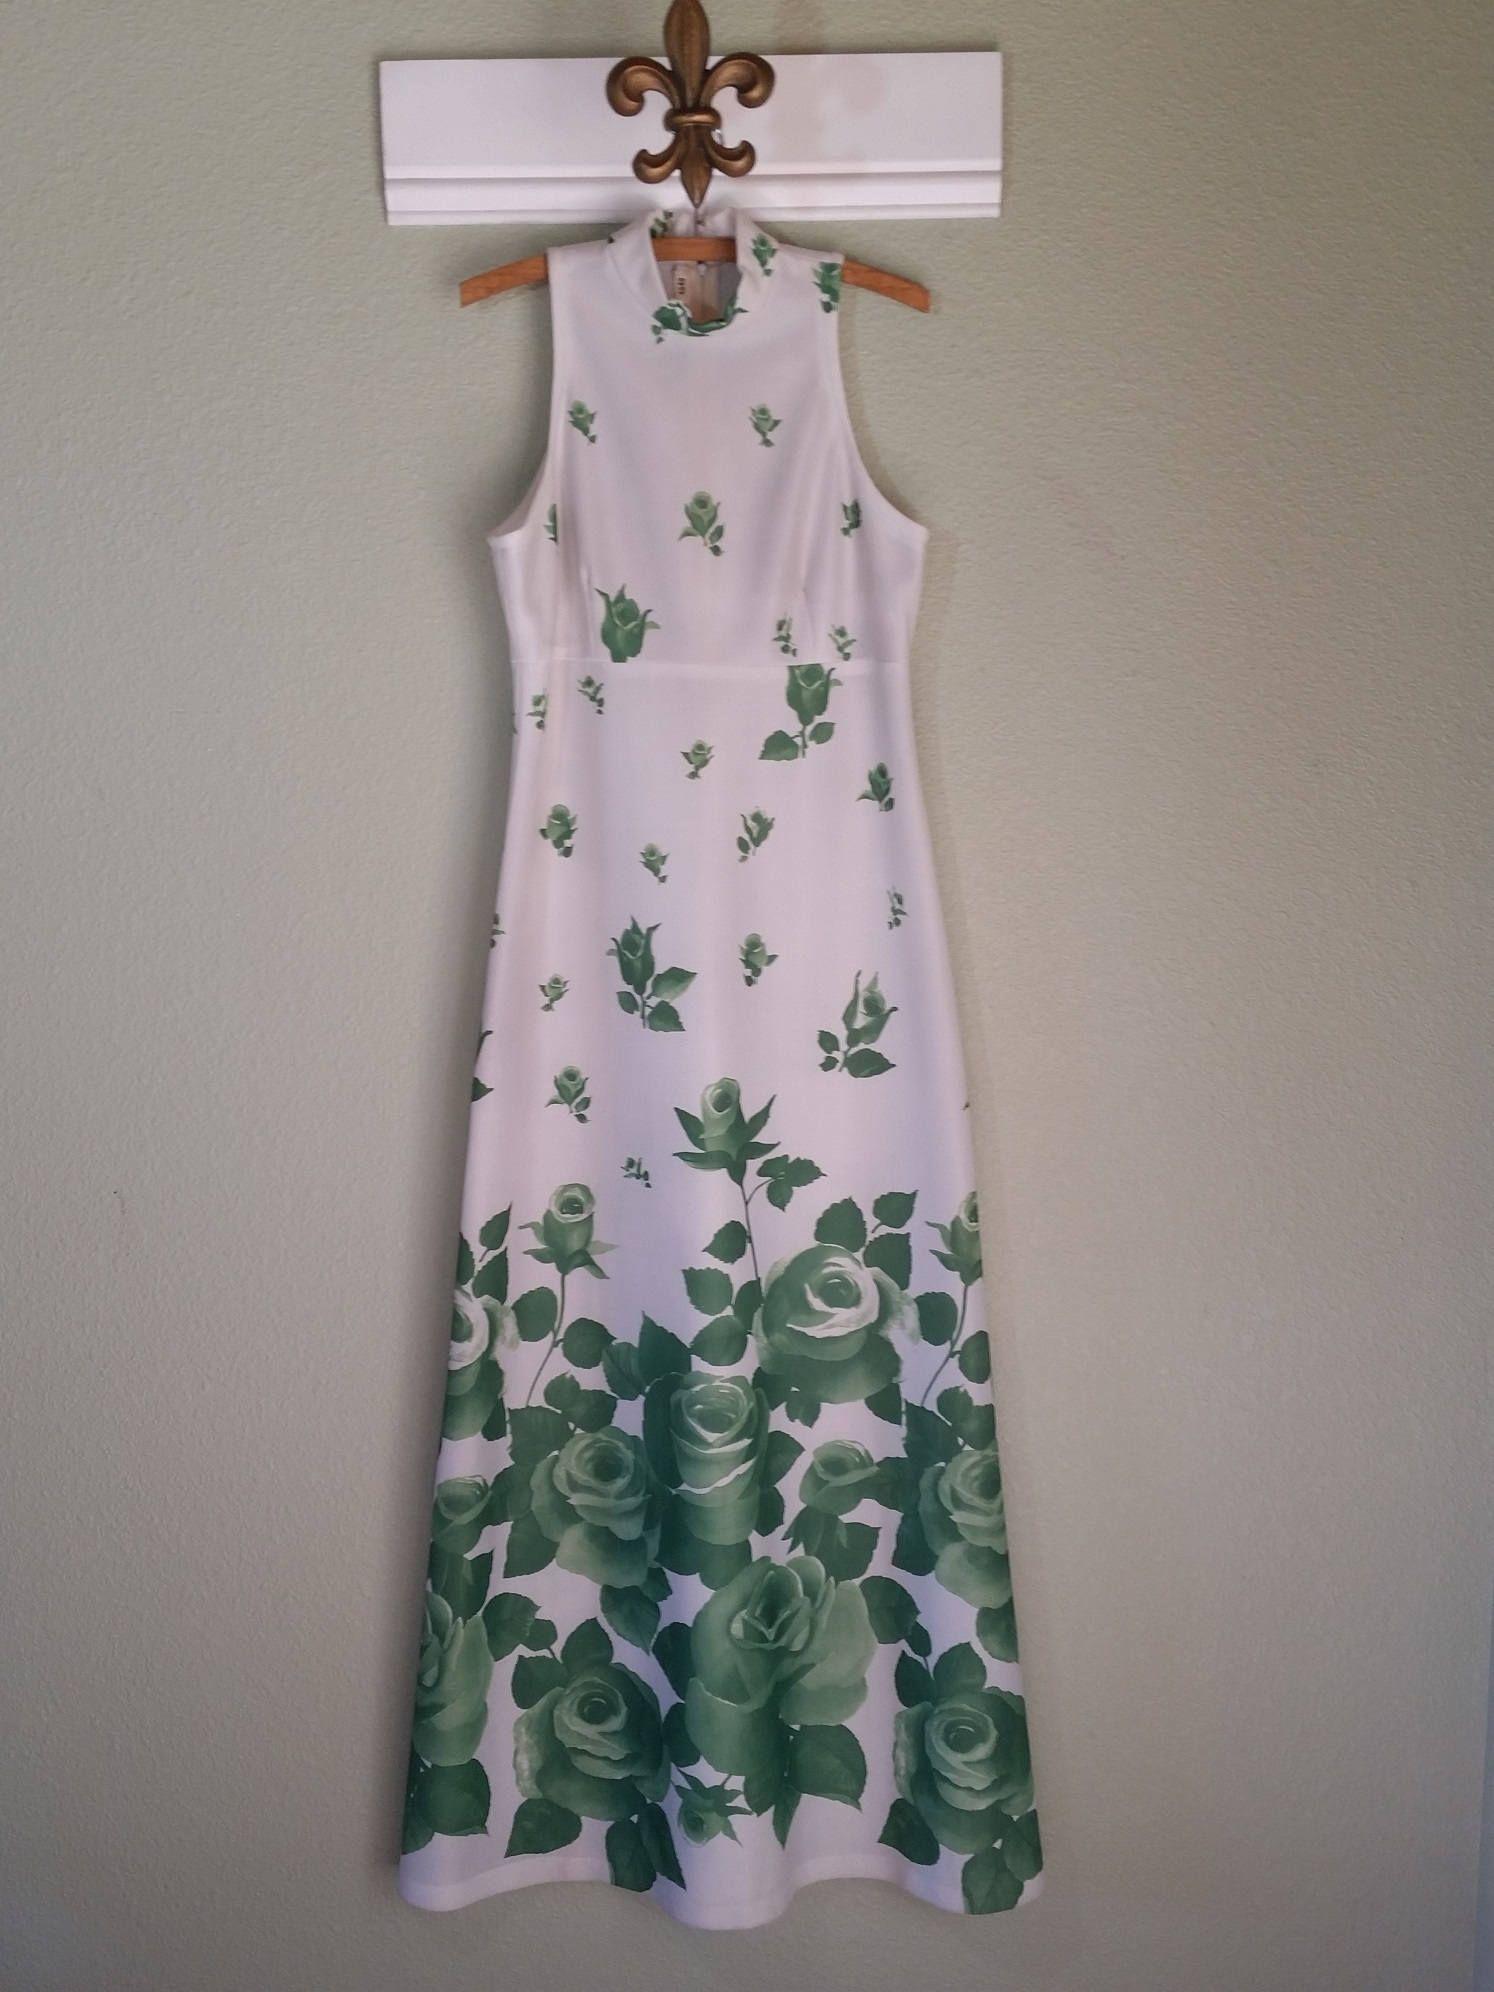 Vintage Maxi Dress Sleeveless Rose Floral Polyester Etsy Vintage Maxi Dress Maxi Dress Vintage Outfits [ 1992 x 1494 Pixel ]